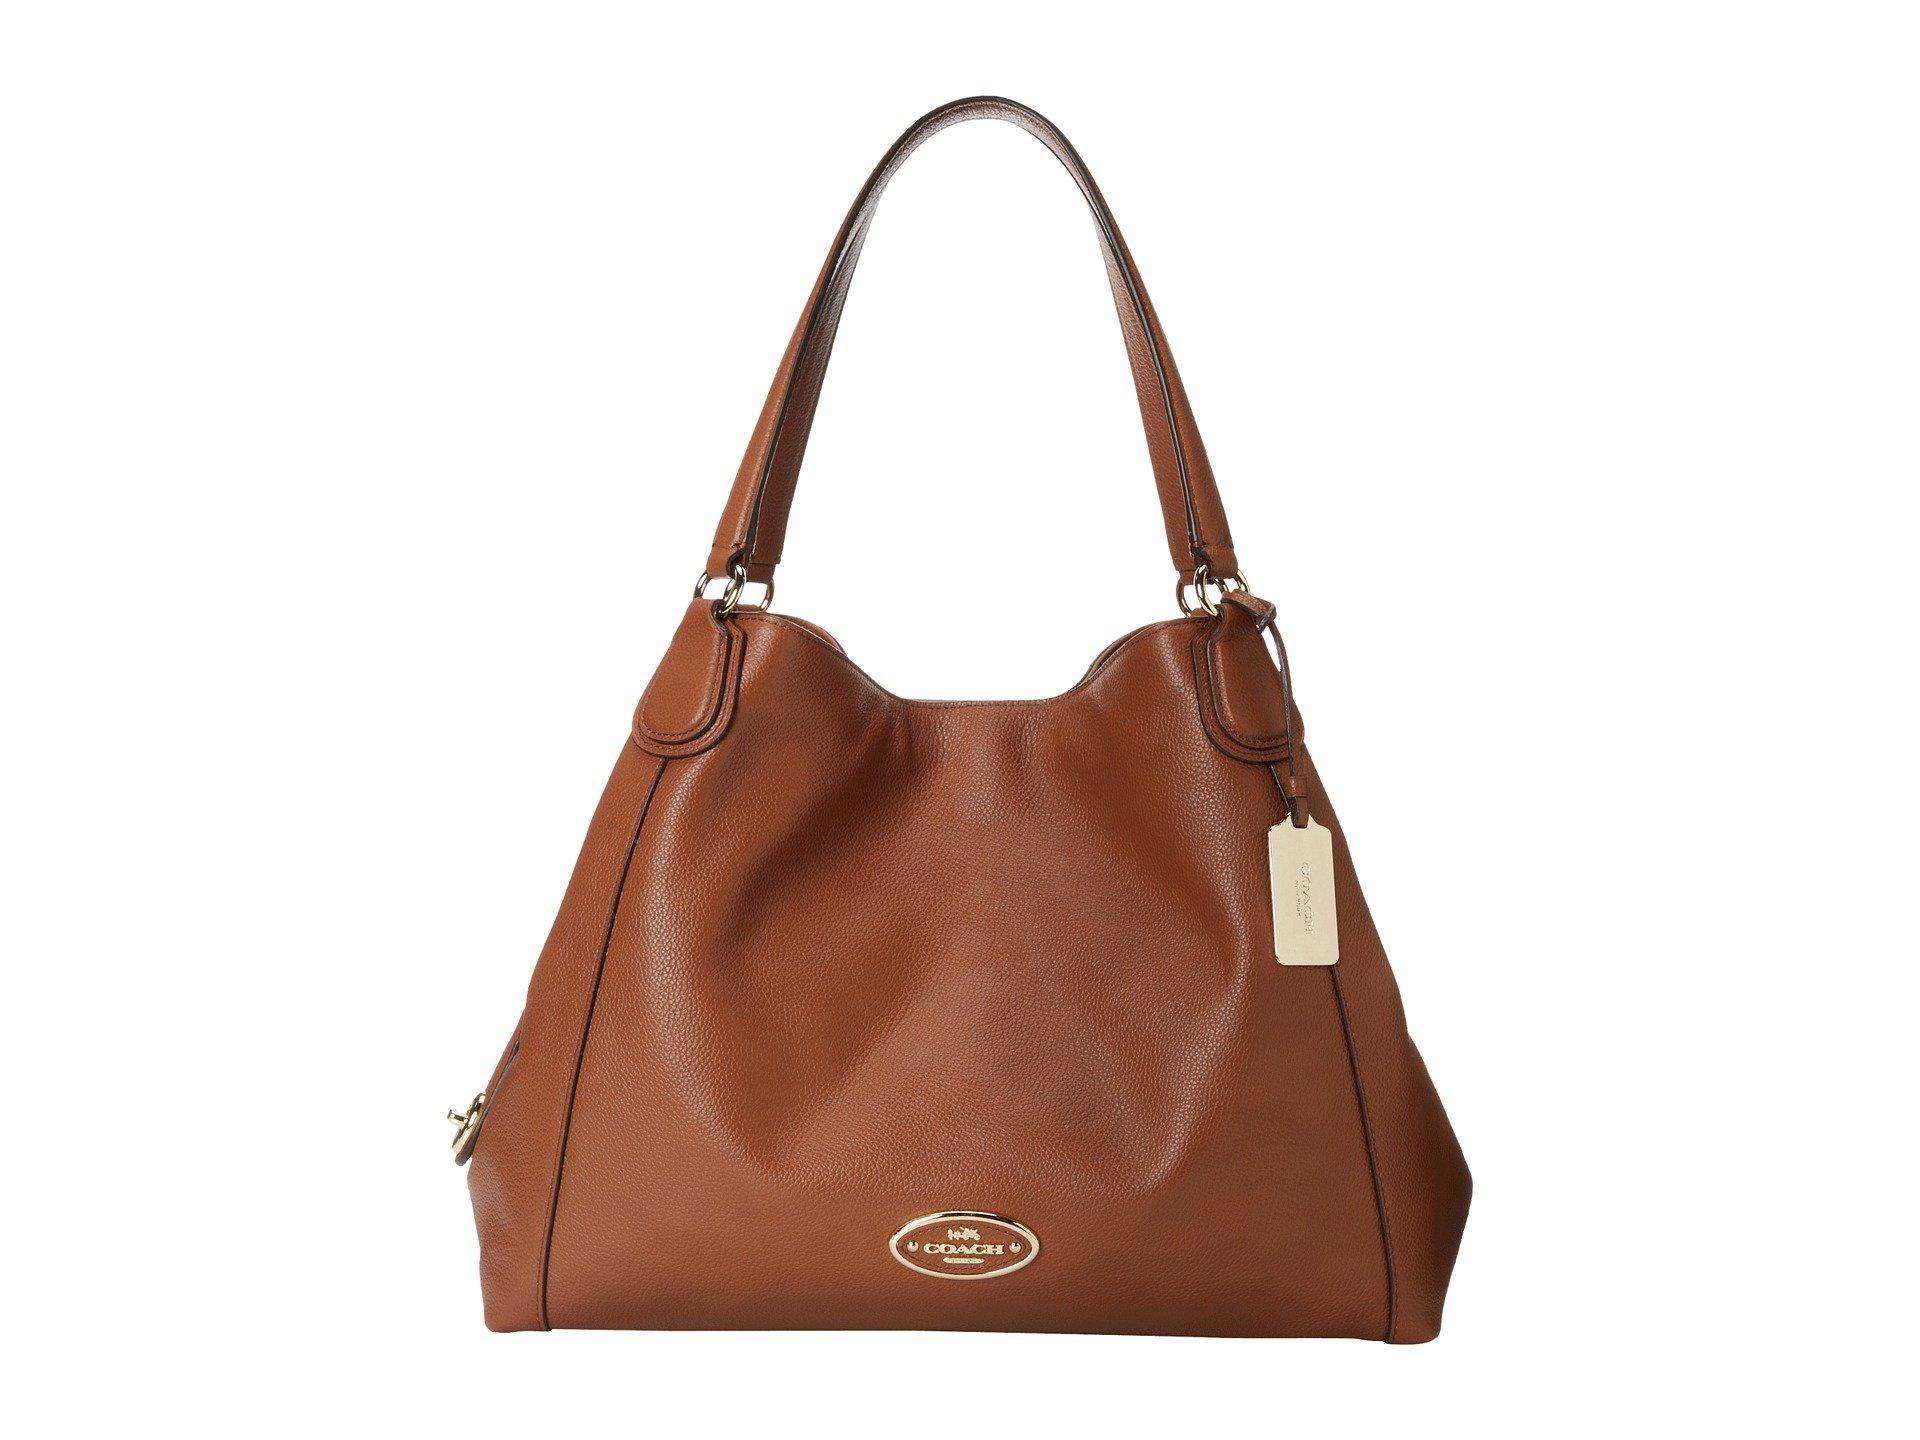 f3de6d5e0f ... switzerland lyst coach refined pebbled leather edie shoulder bag in  brown 9e488 26b56